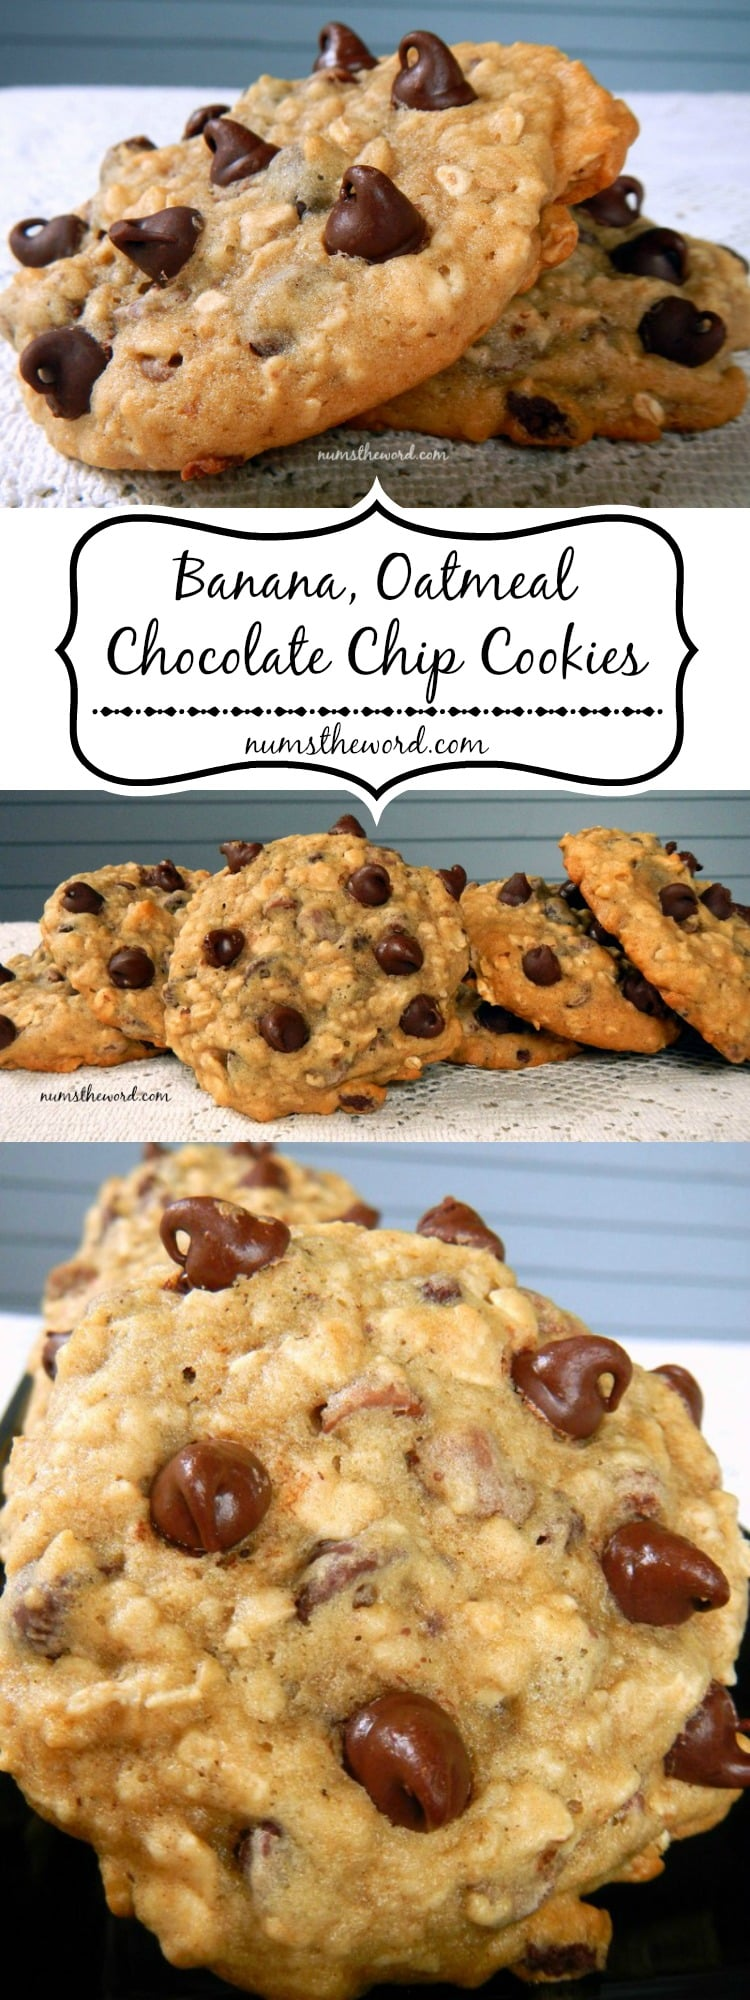 Banana, Oatmeal, Chocolate Chip Cookies - NumsTheWord